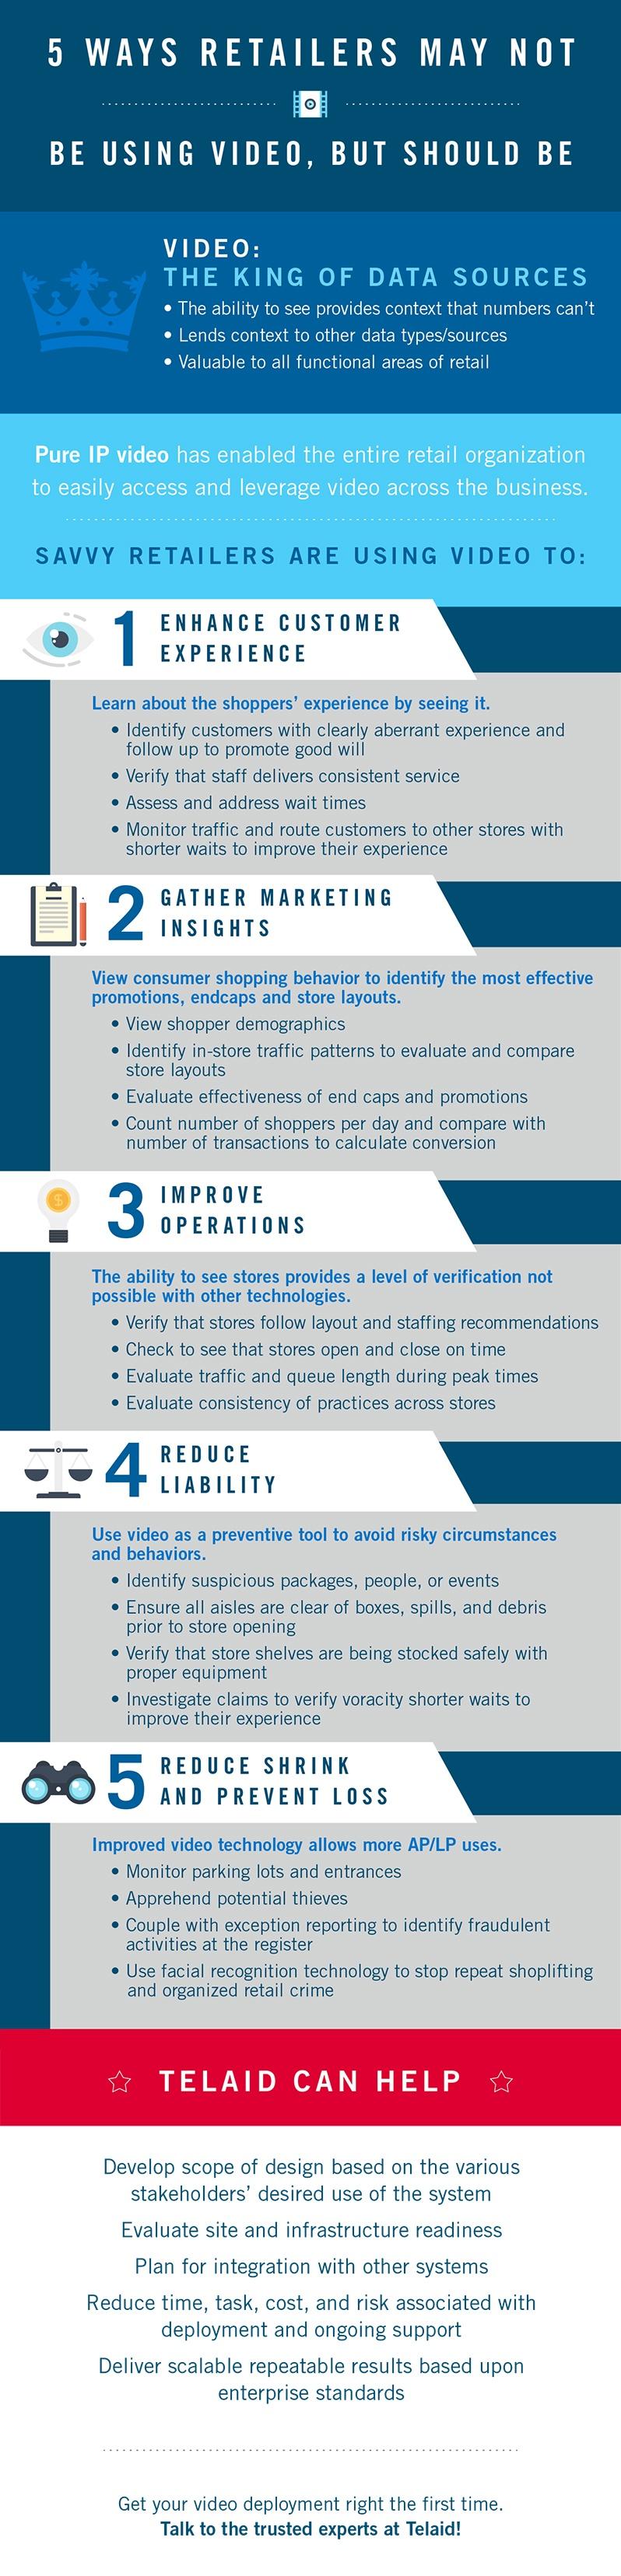 IP Video Infographic